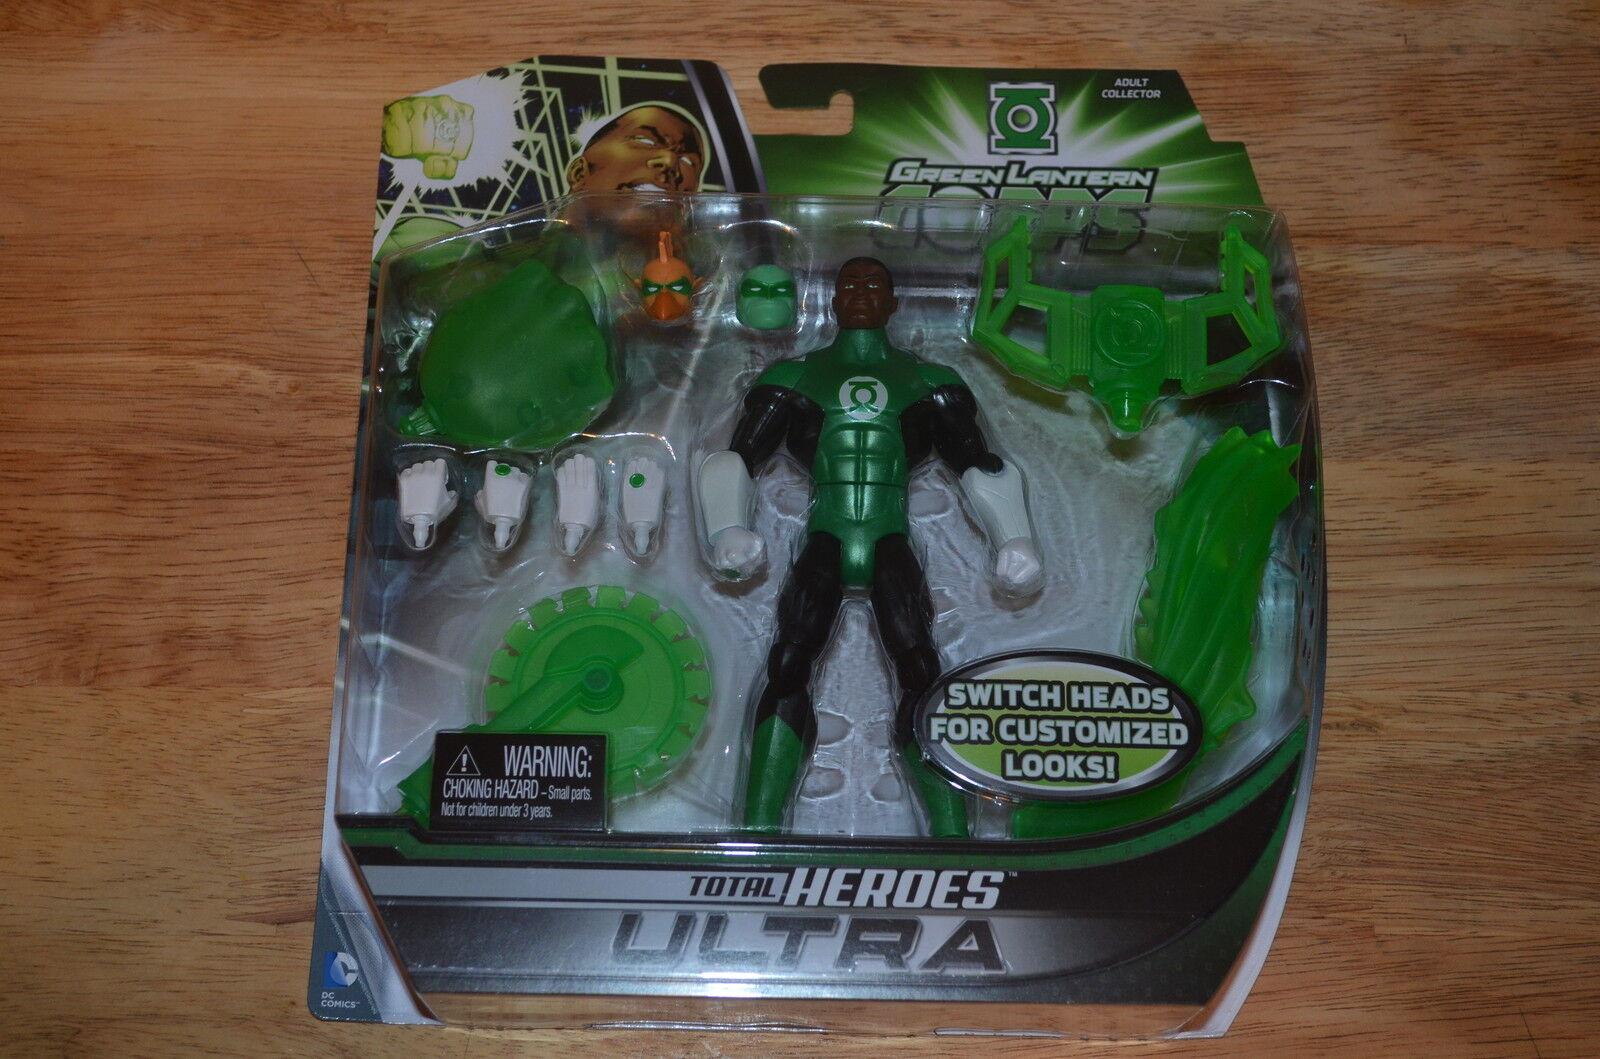 Mattel DC COMICS TOTAL HEROES ULTRA GREEN LANTERN CORPS Deluxe Action Figure